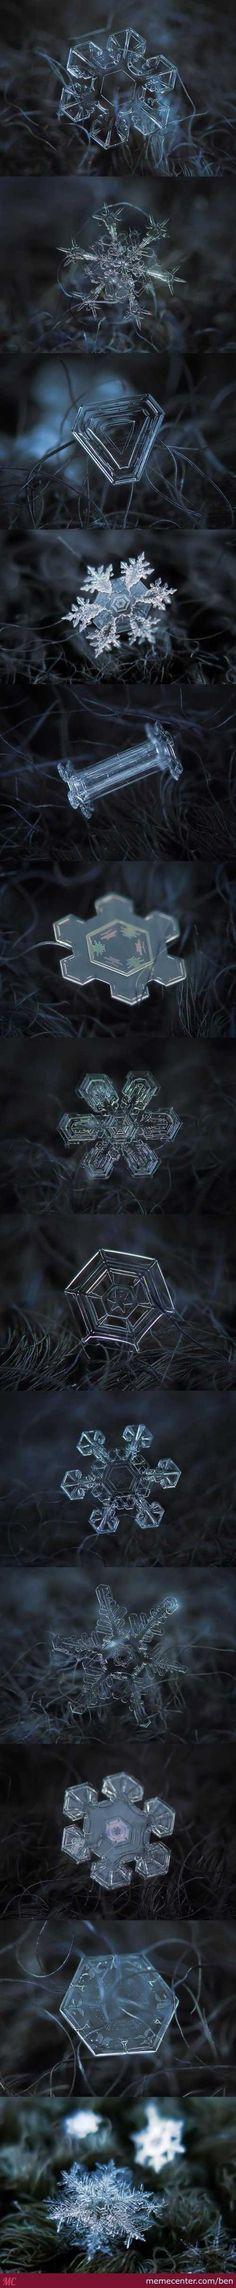 snowflake sacred geometry